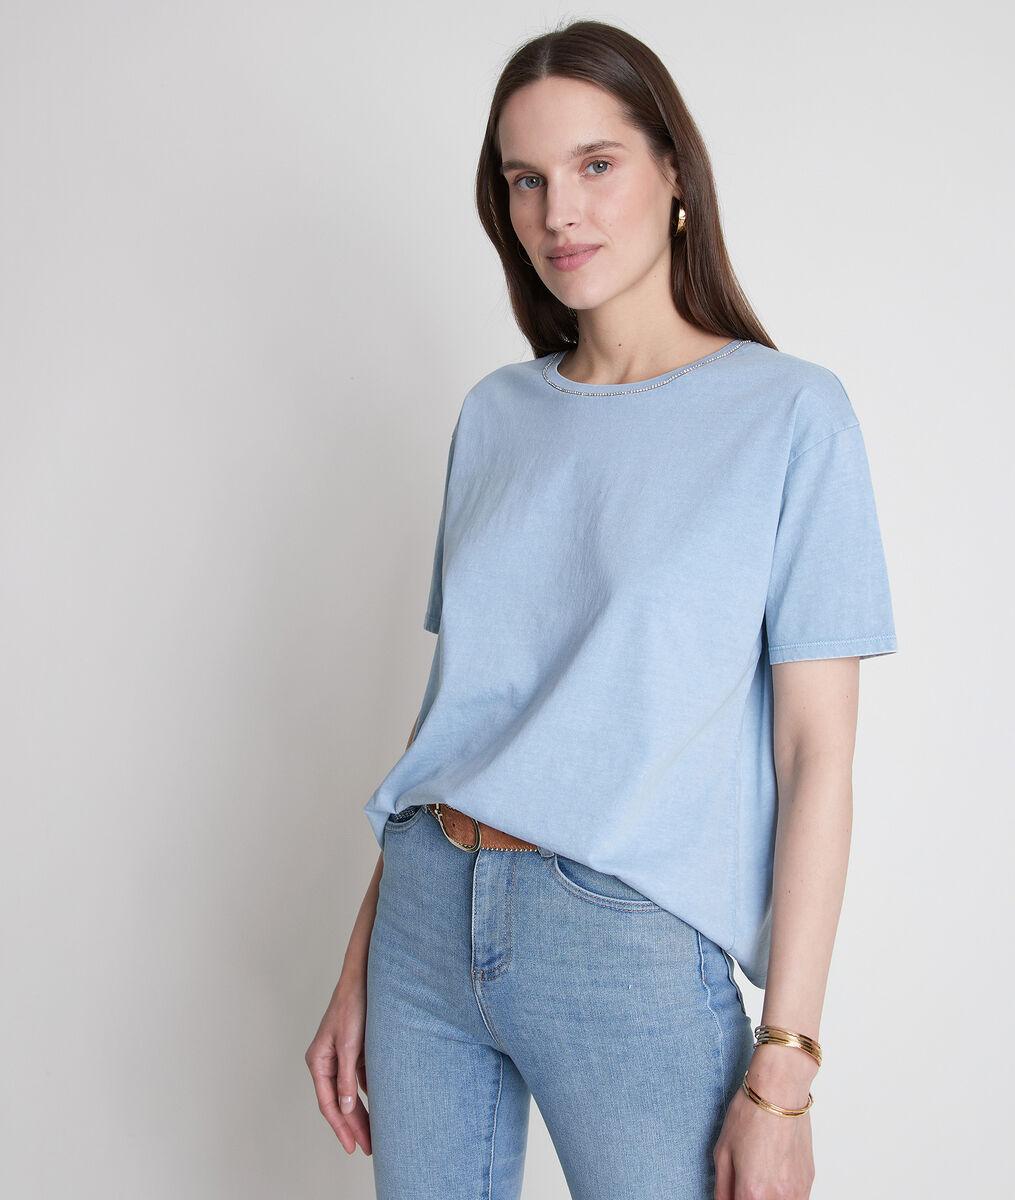 Tee-shirt en coton bio et col strassé bleu ciel Inox PhotoZ | 1-2-3